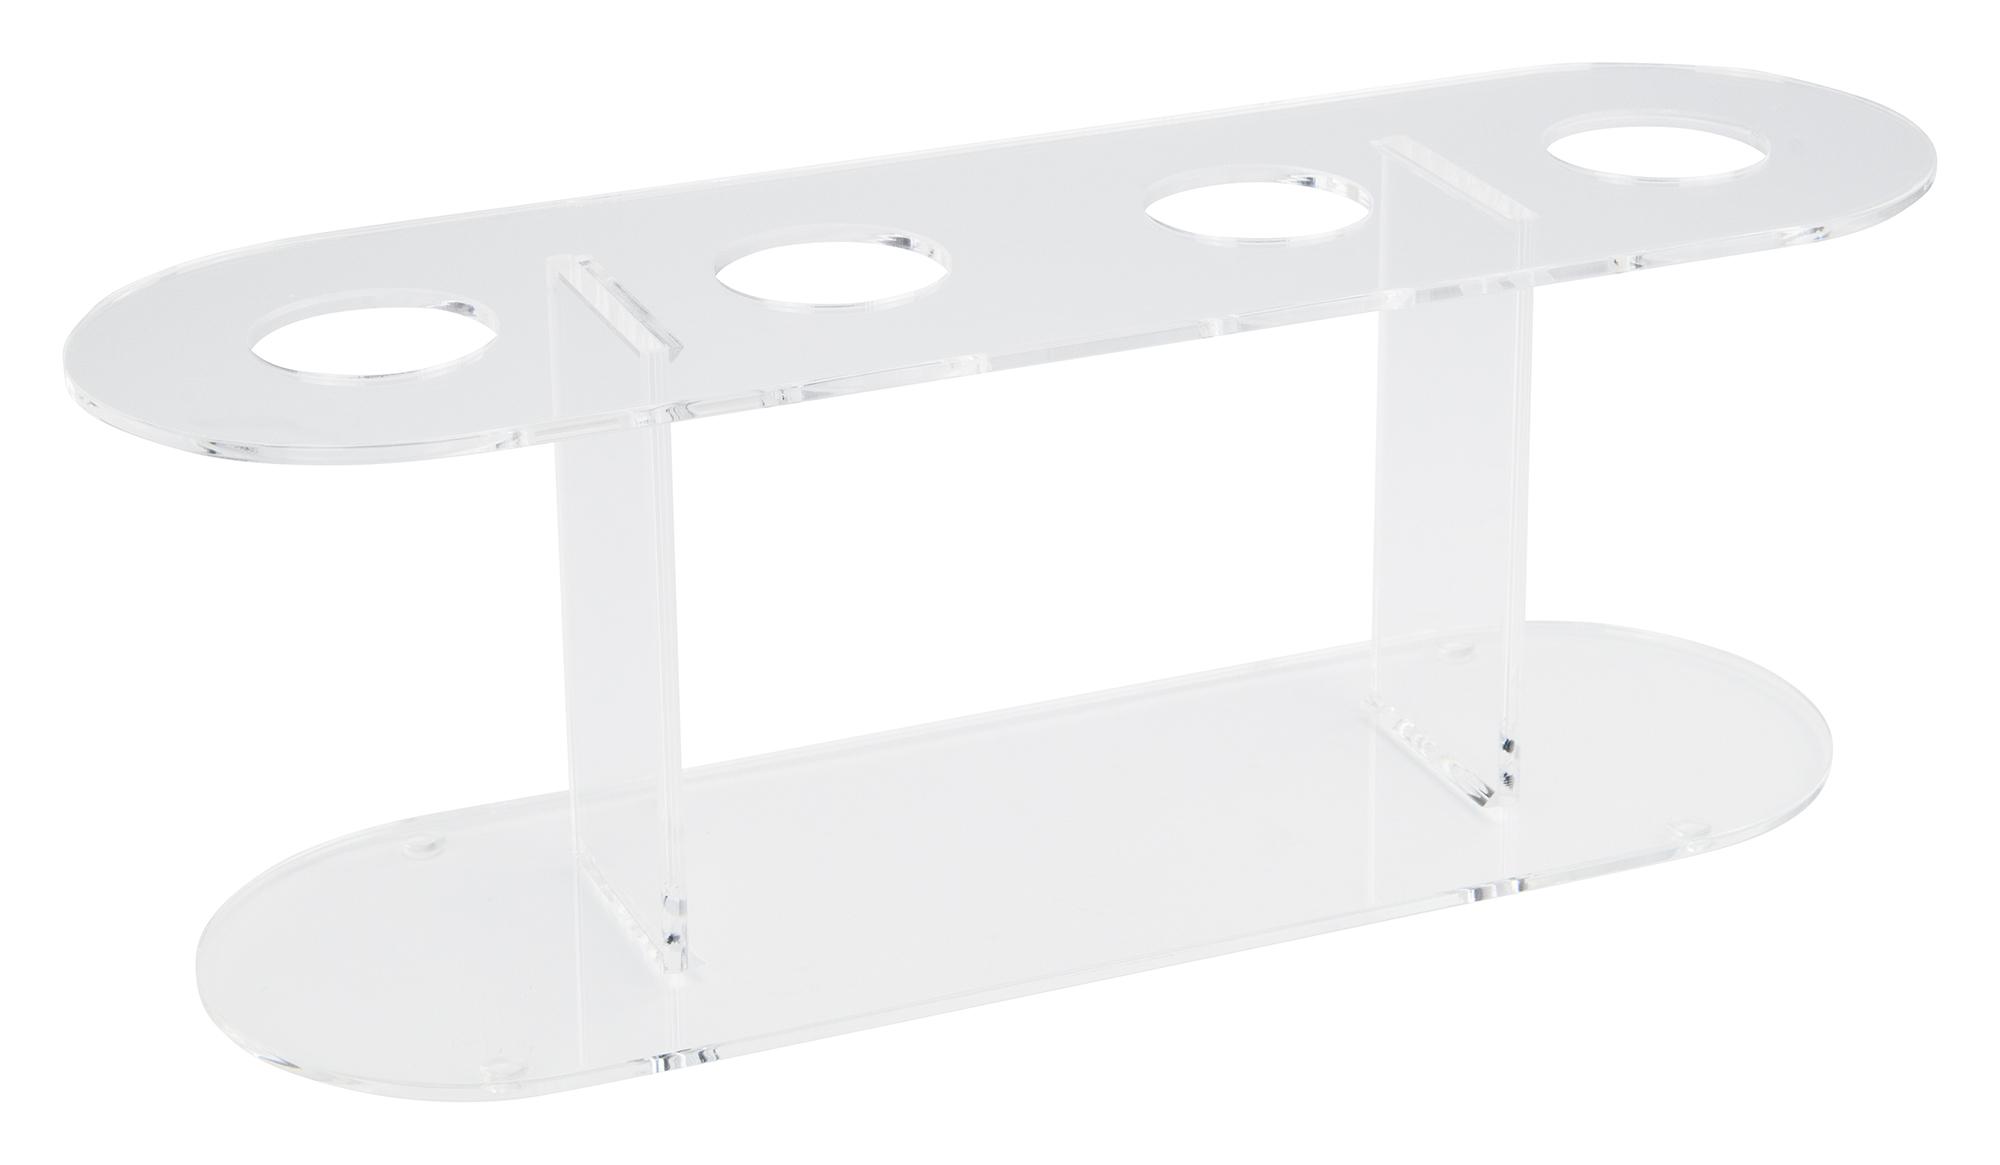 Winco ACN-4 acrylic displays